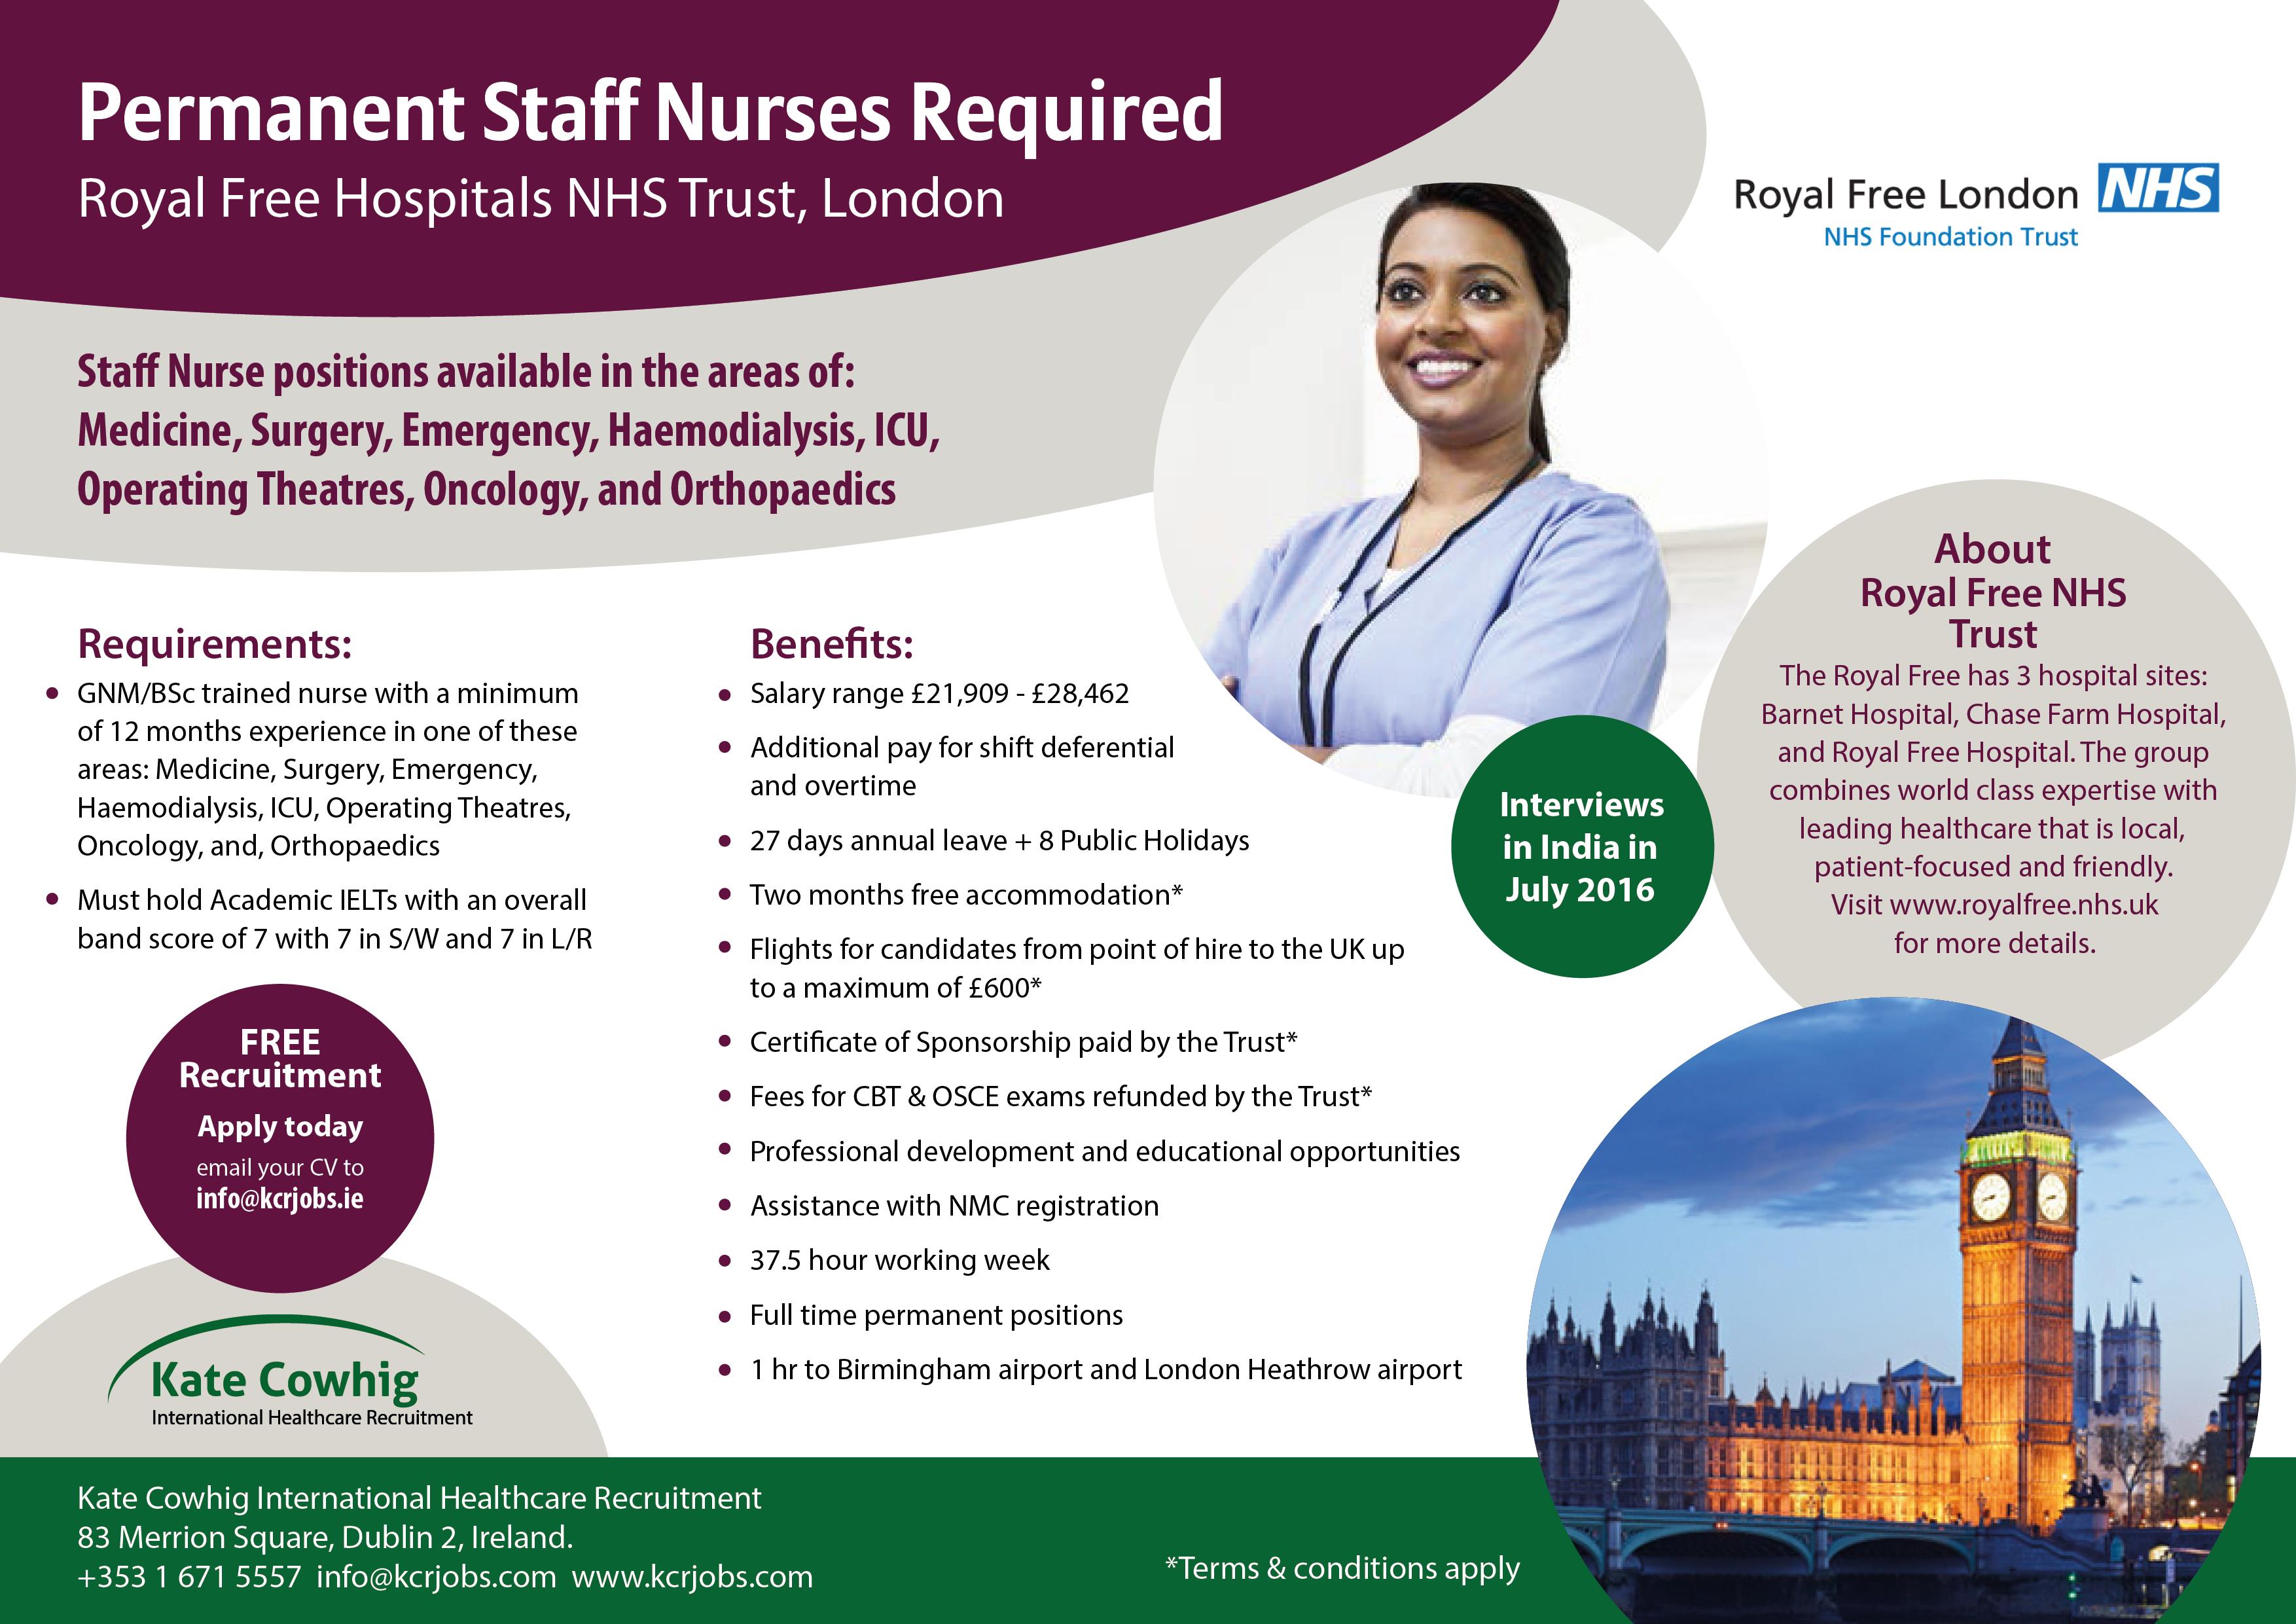 Nursing Jobs Nurse Nurses Nursing Realnurse Nursepractitioner Job Hiring Nurserydecor Nursesrock N Nursing Jobs International Nursing Jobs Nurse